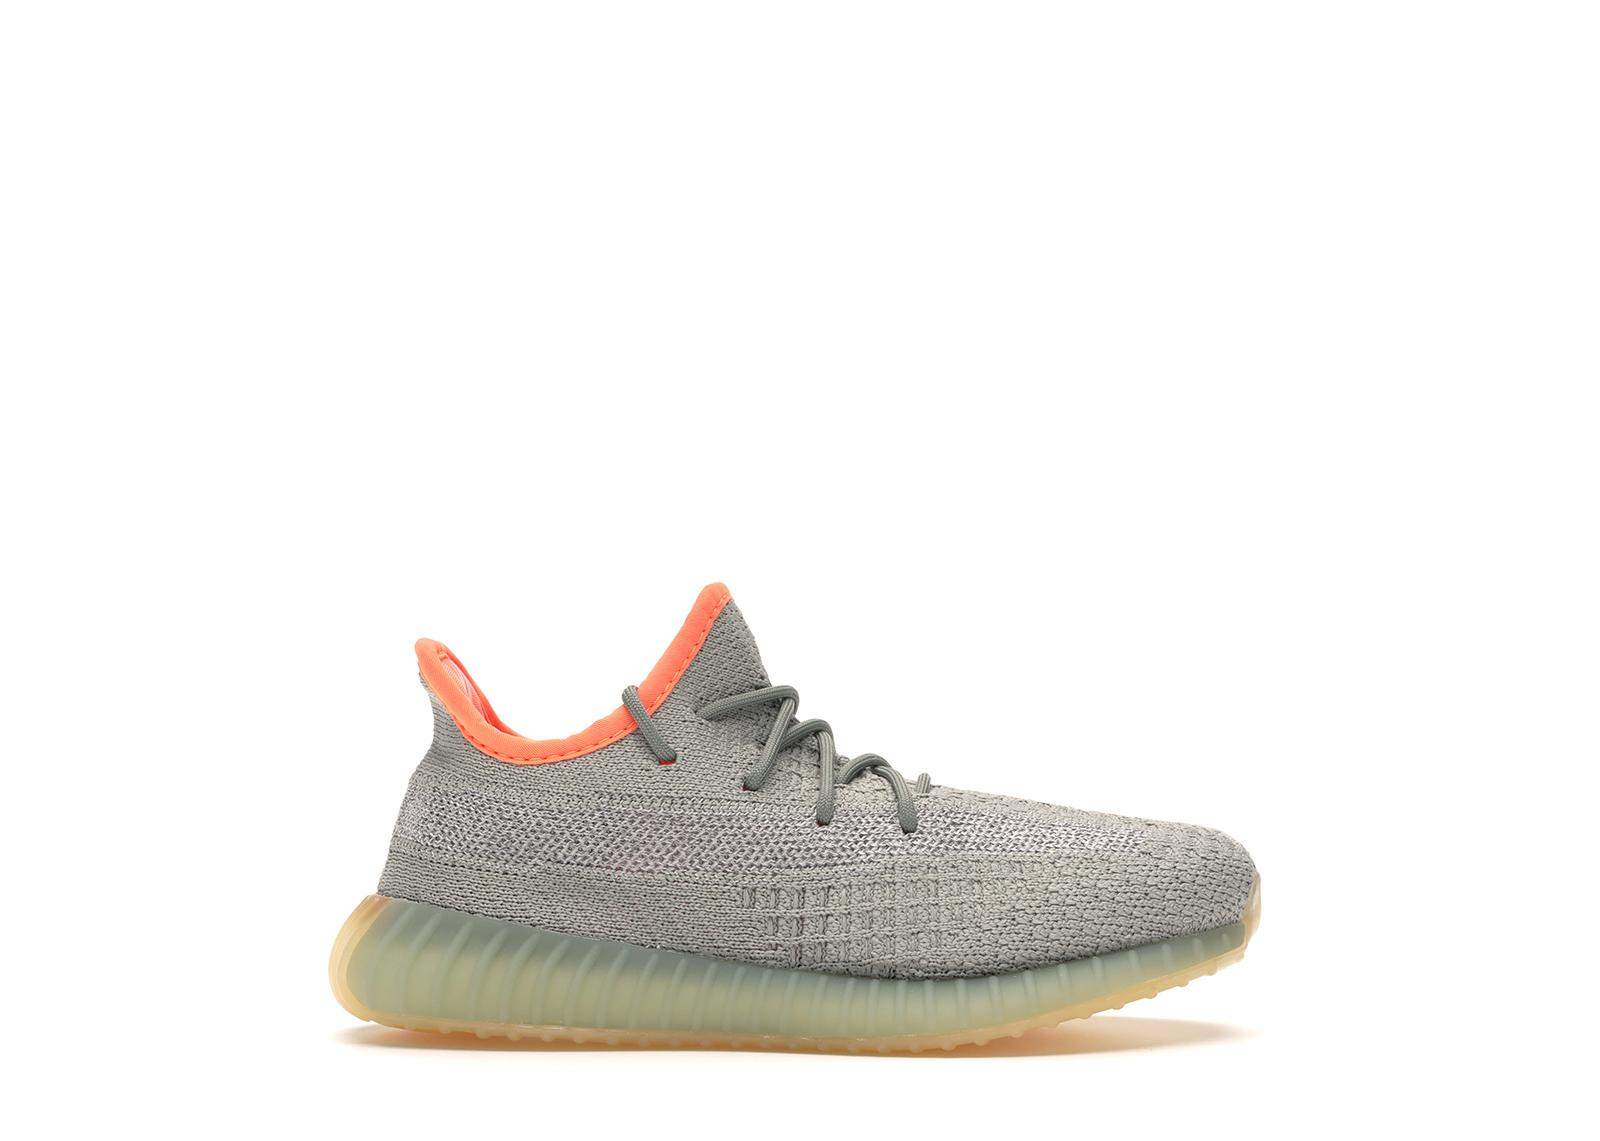 adidas yeezy boost 350 v2 desert